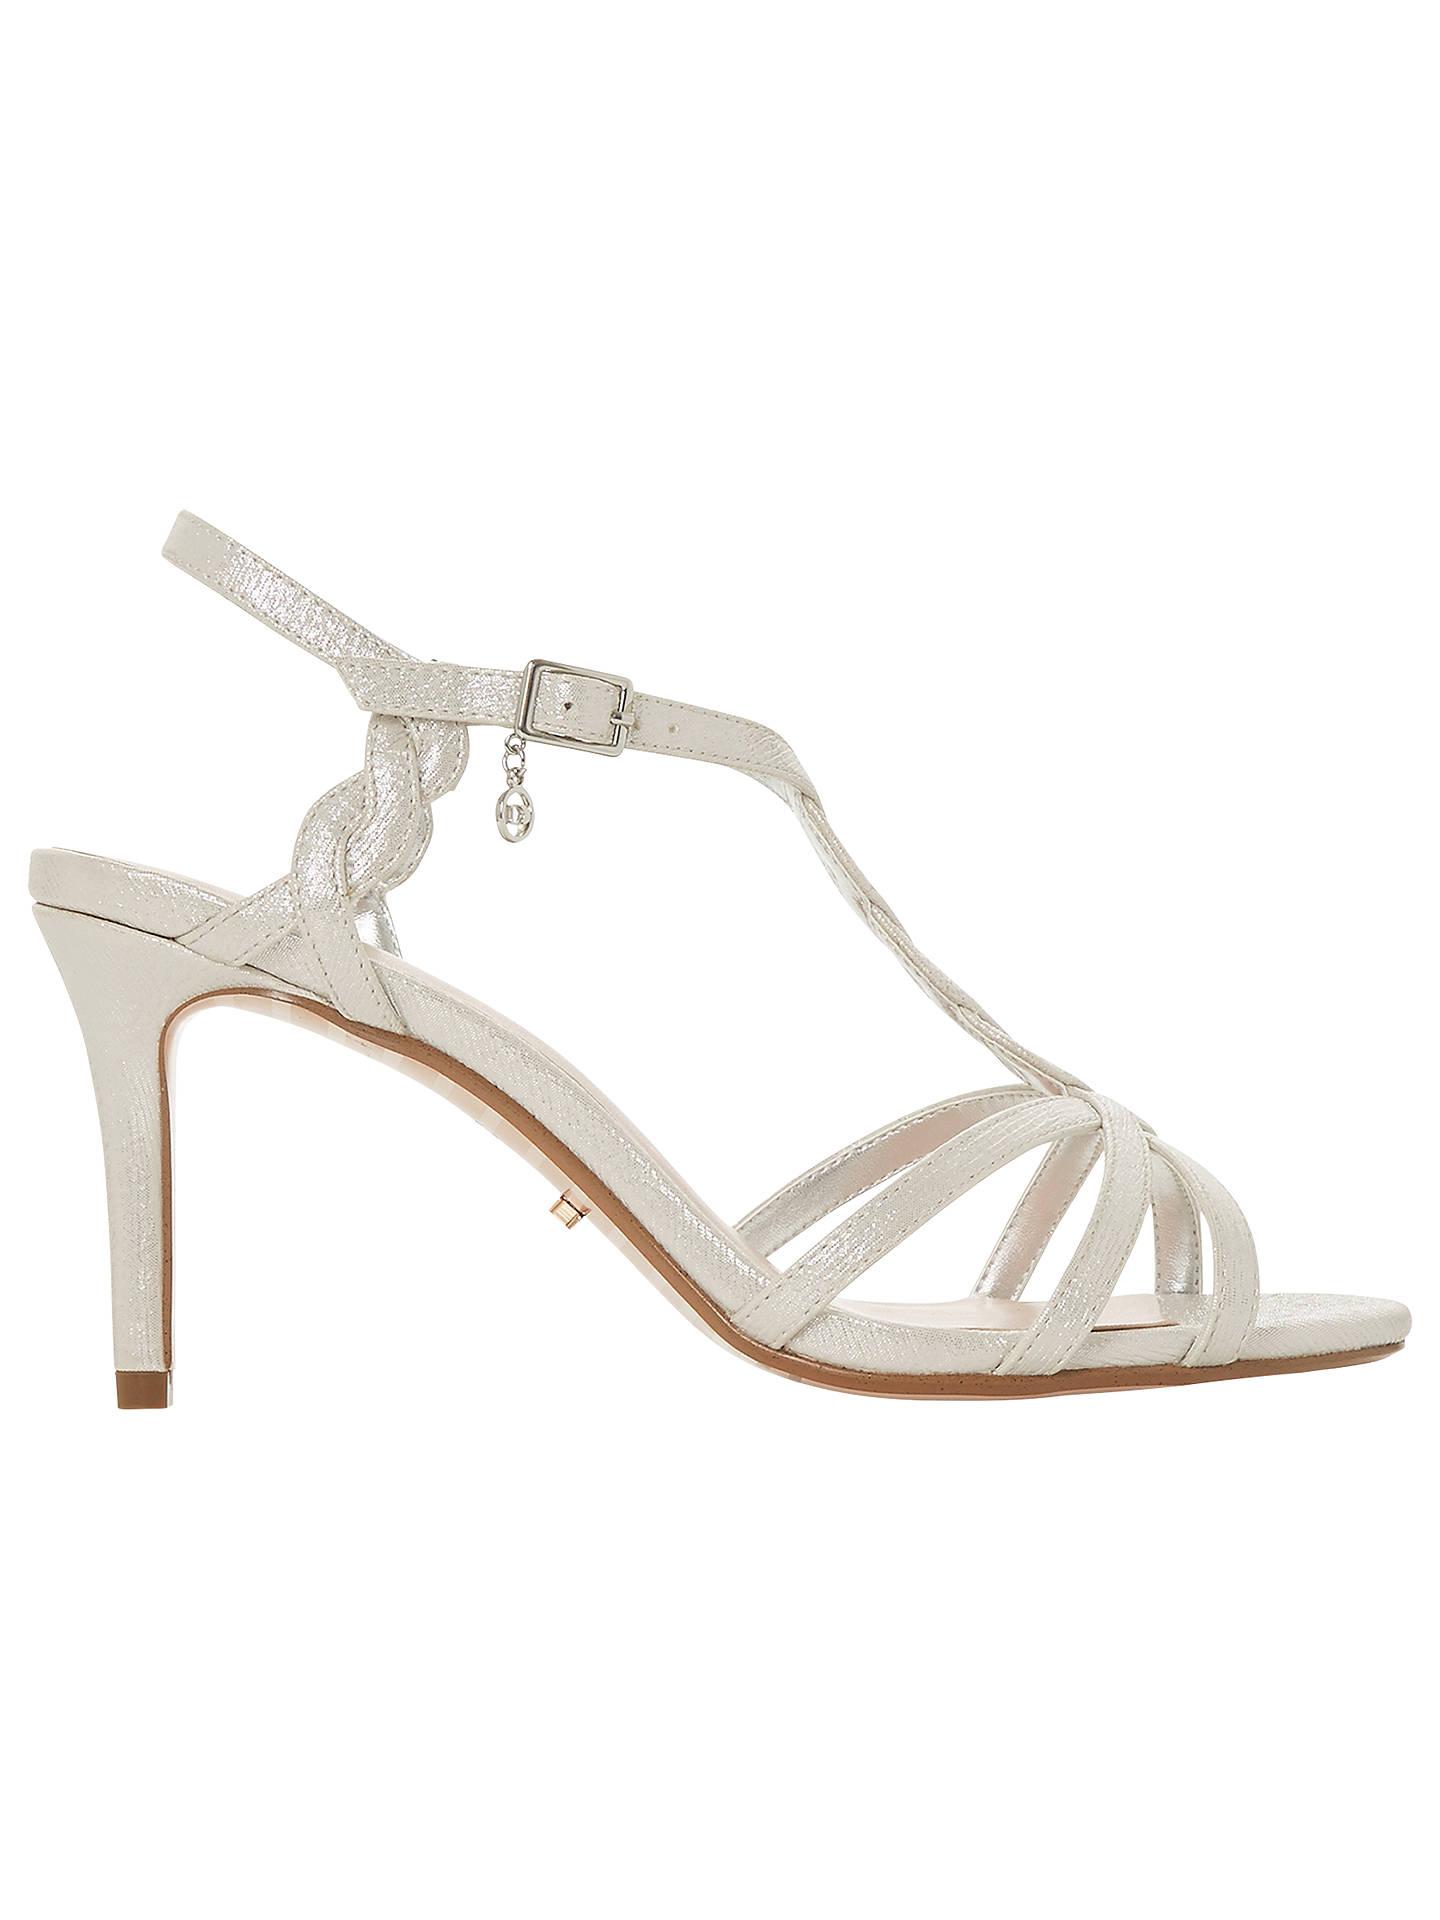 0fccbb4ac1b Buy Dune Wide Fit Mystick Stiletto Heel Sandals